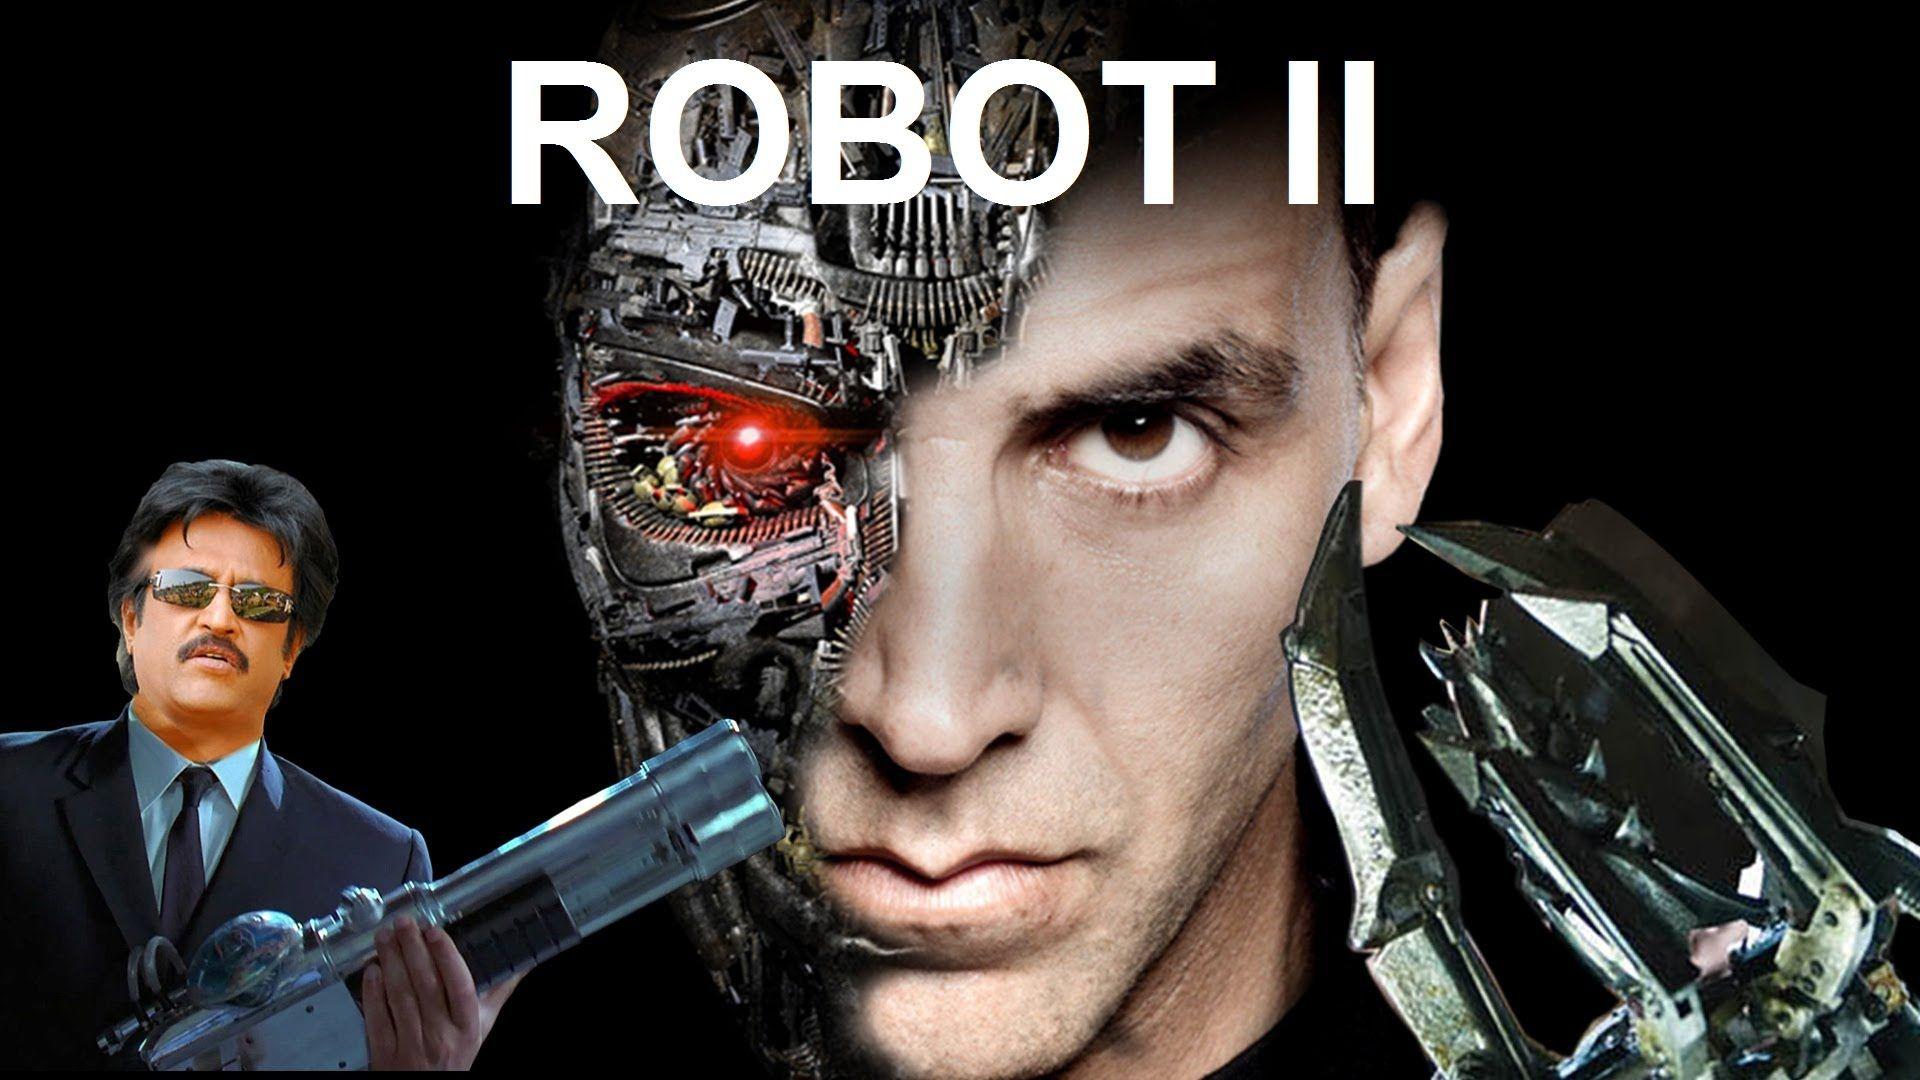 ROBOT 2 New Trailer 2016 Unofficial Trailer Movies online